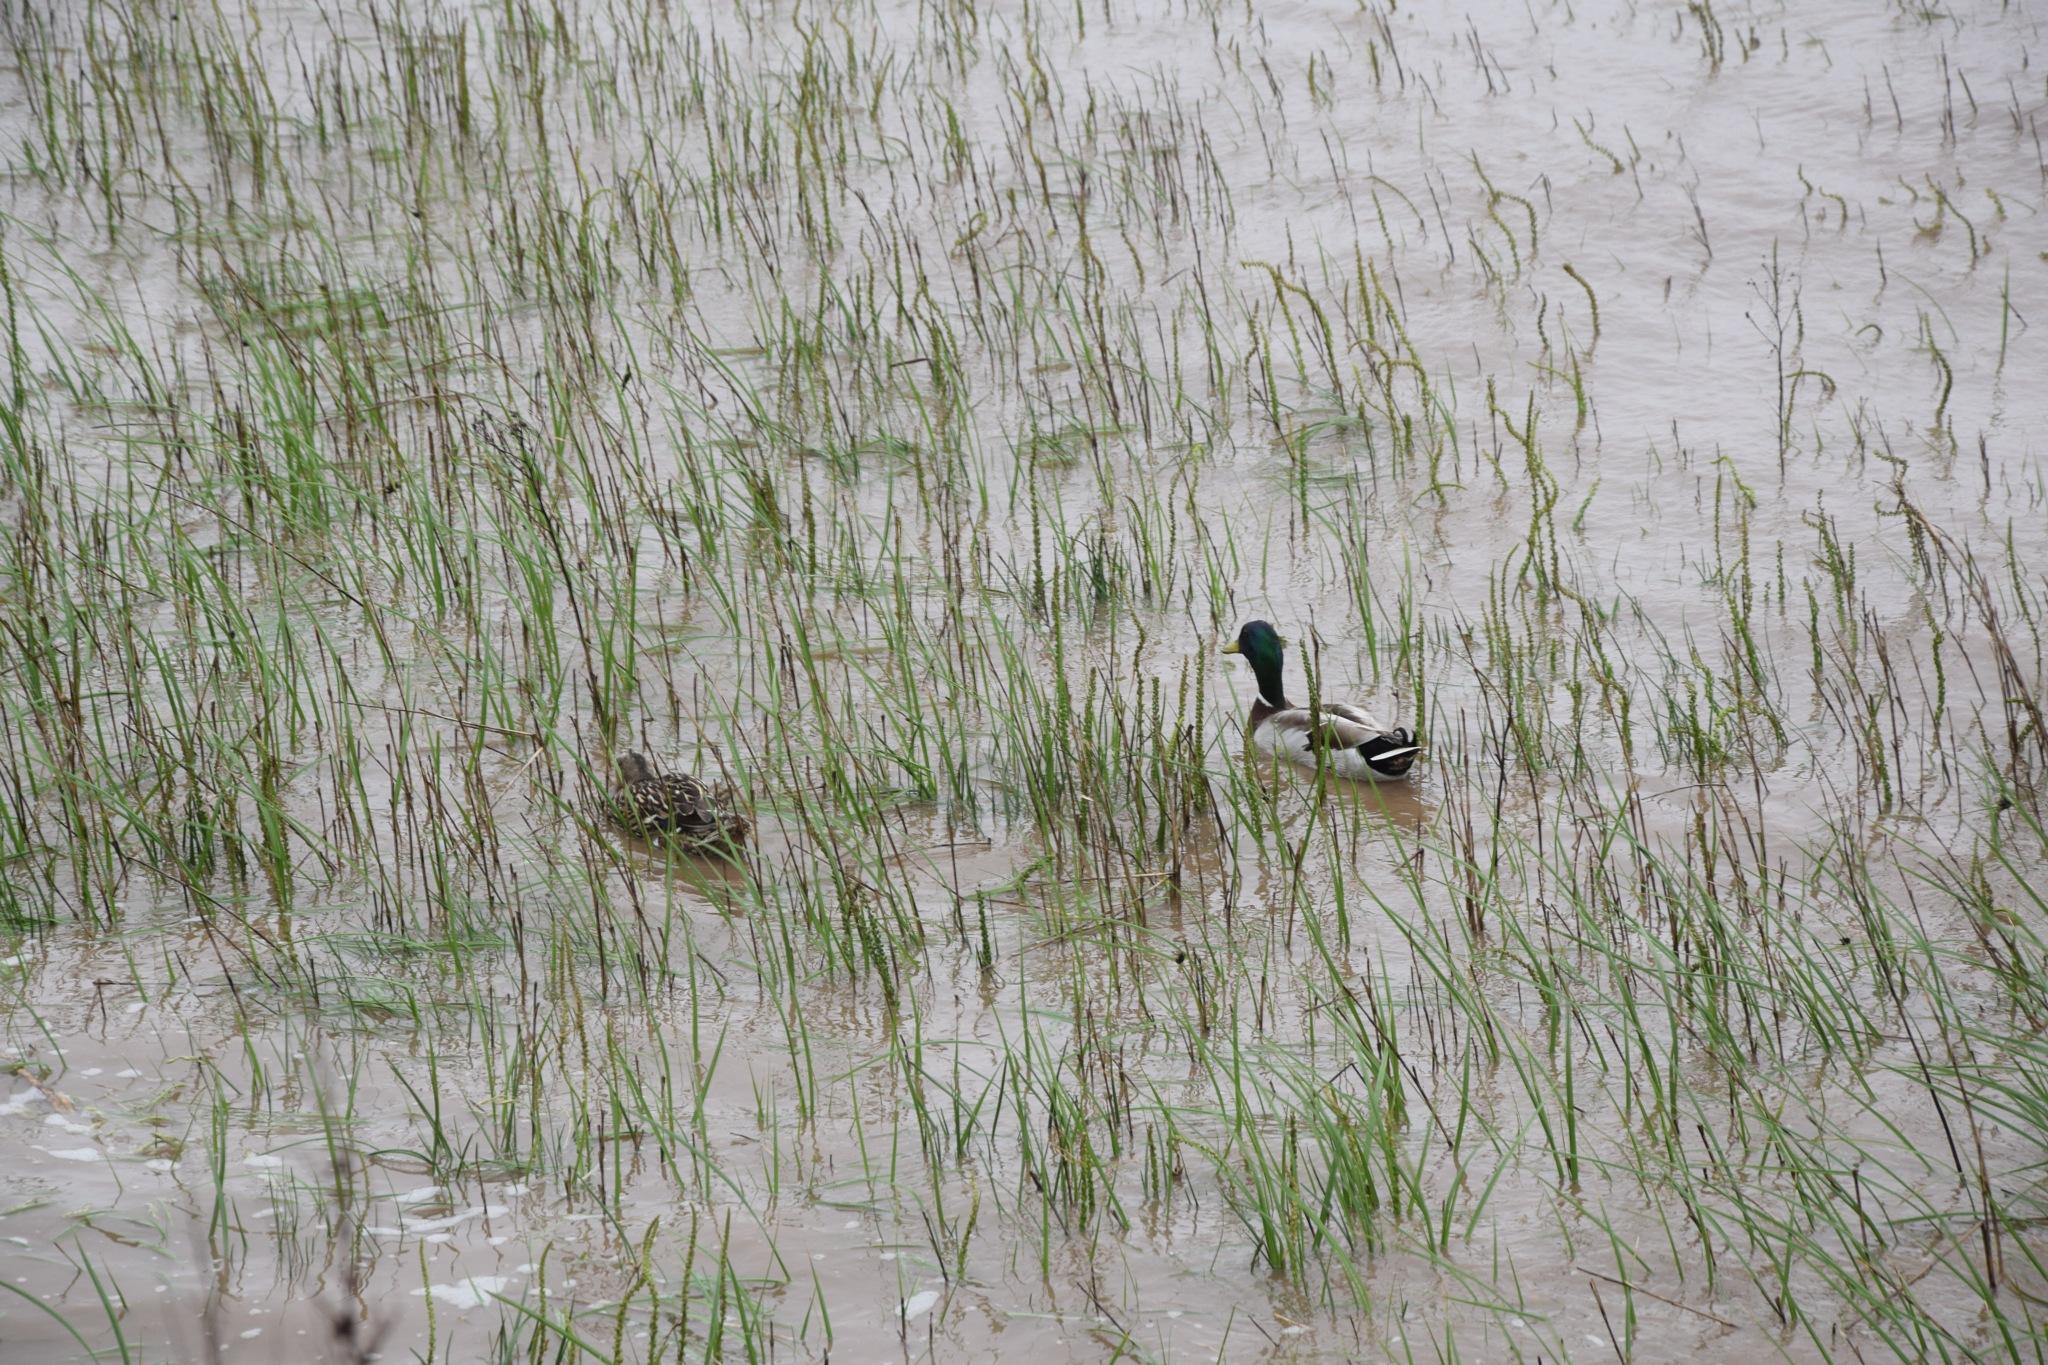 Ducks on the River Humber by GraemeLeePollard